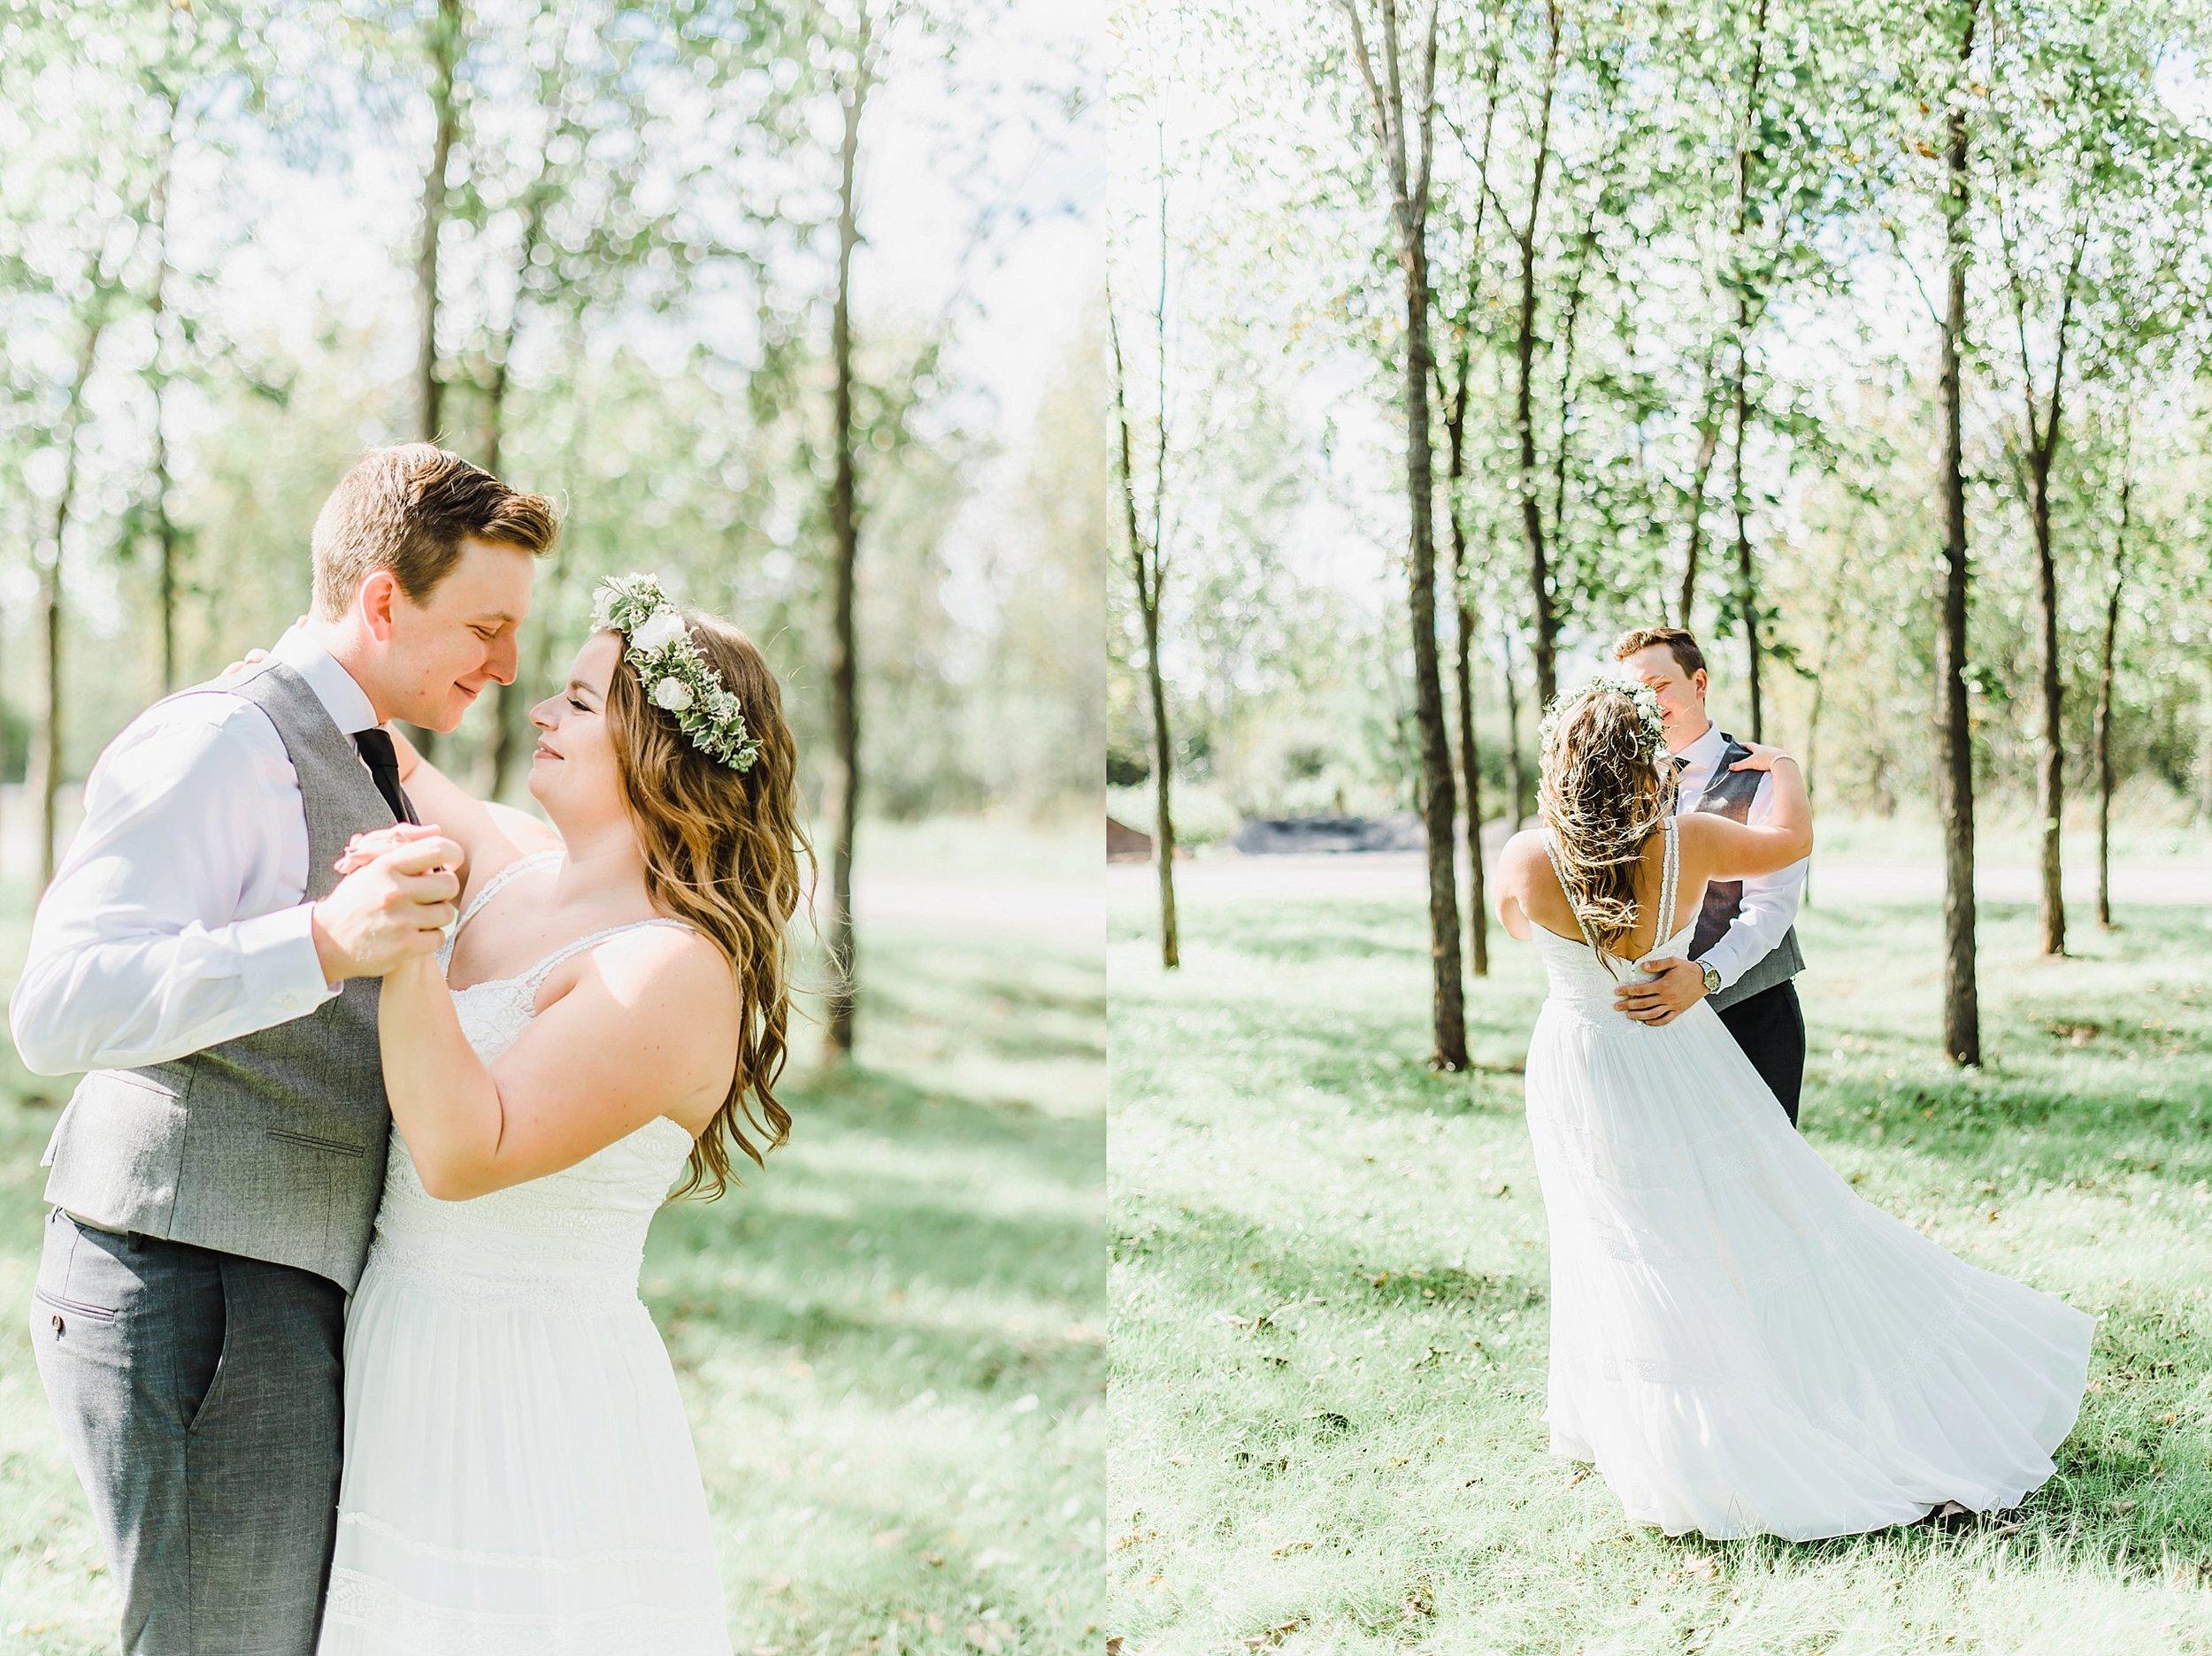 light airy indie fine art ottawa wedding photographer | Ali and Batoul Photography_1116.jpg